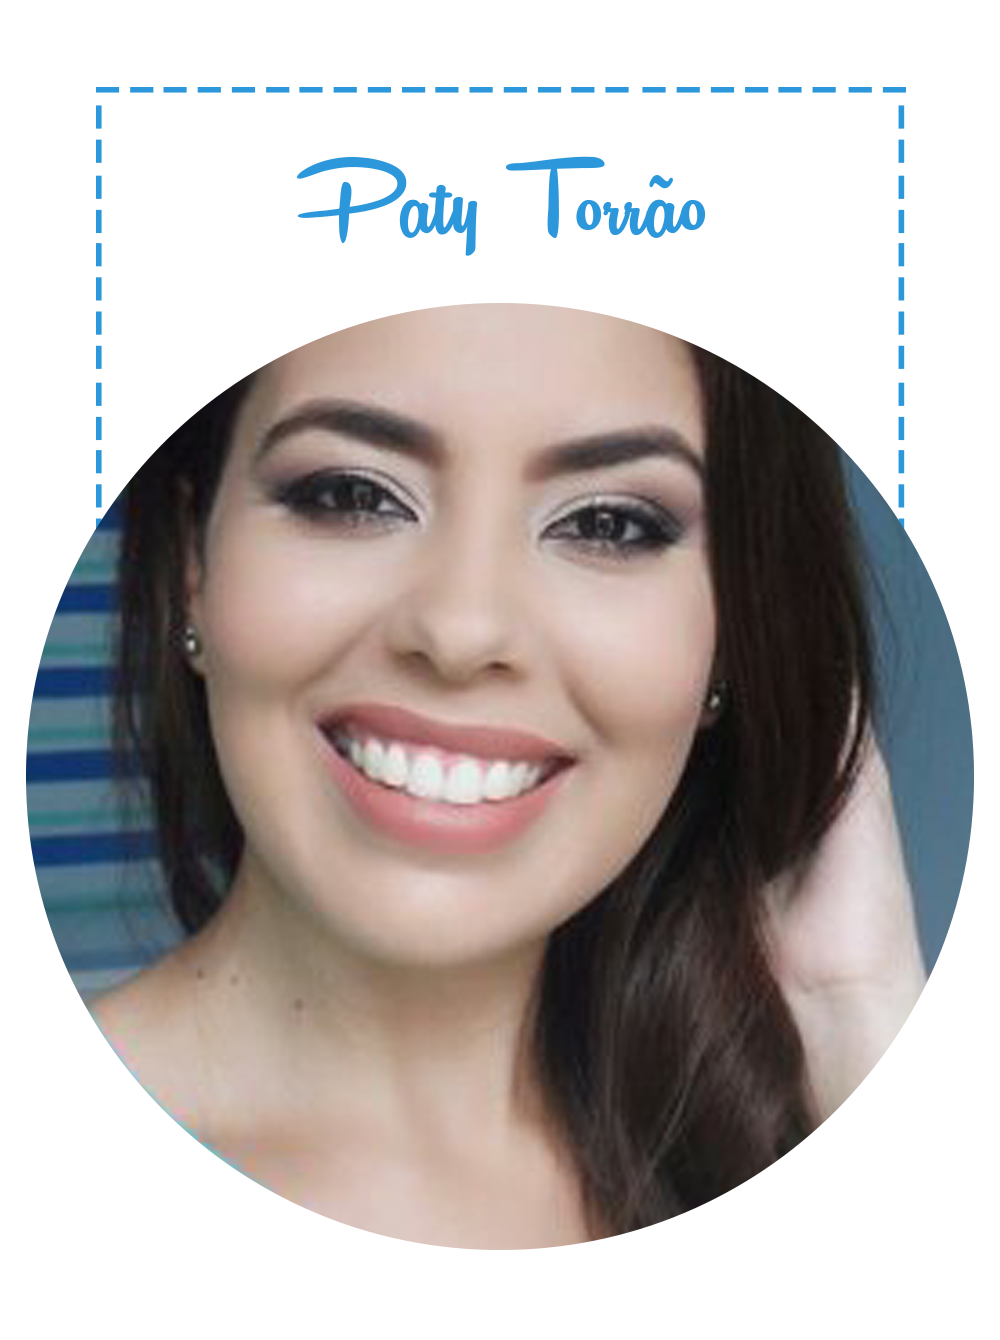 foto-perfil-blog-patricia-torrao